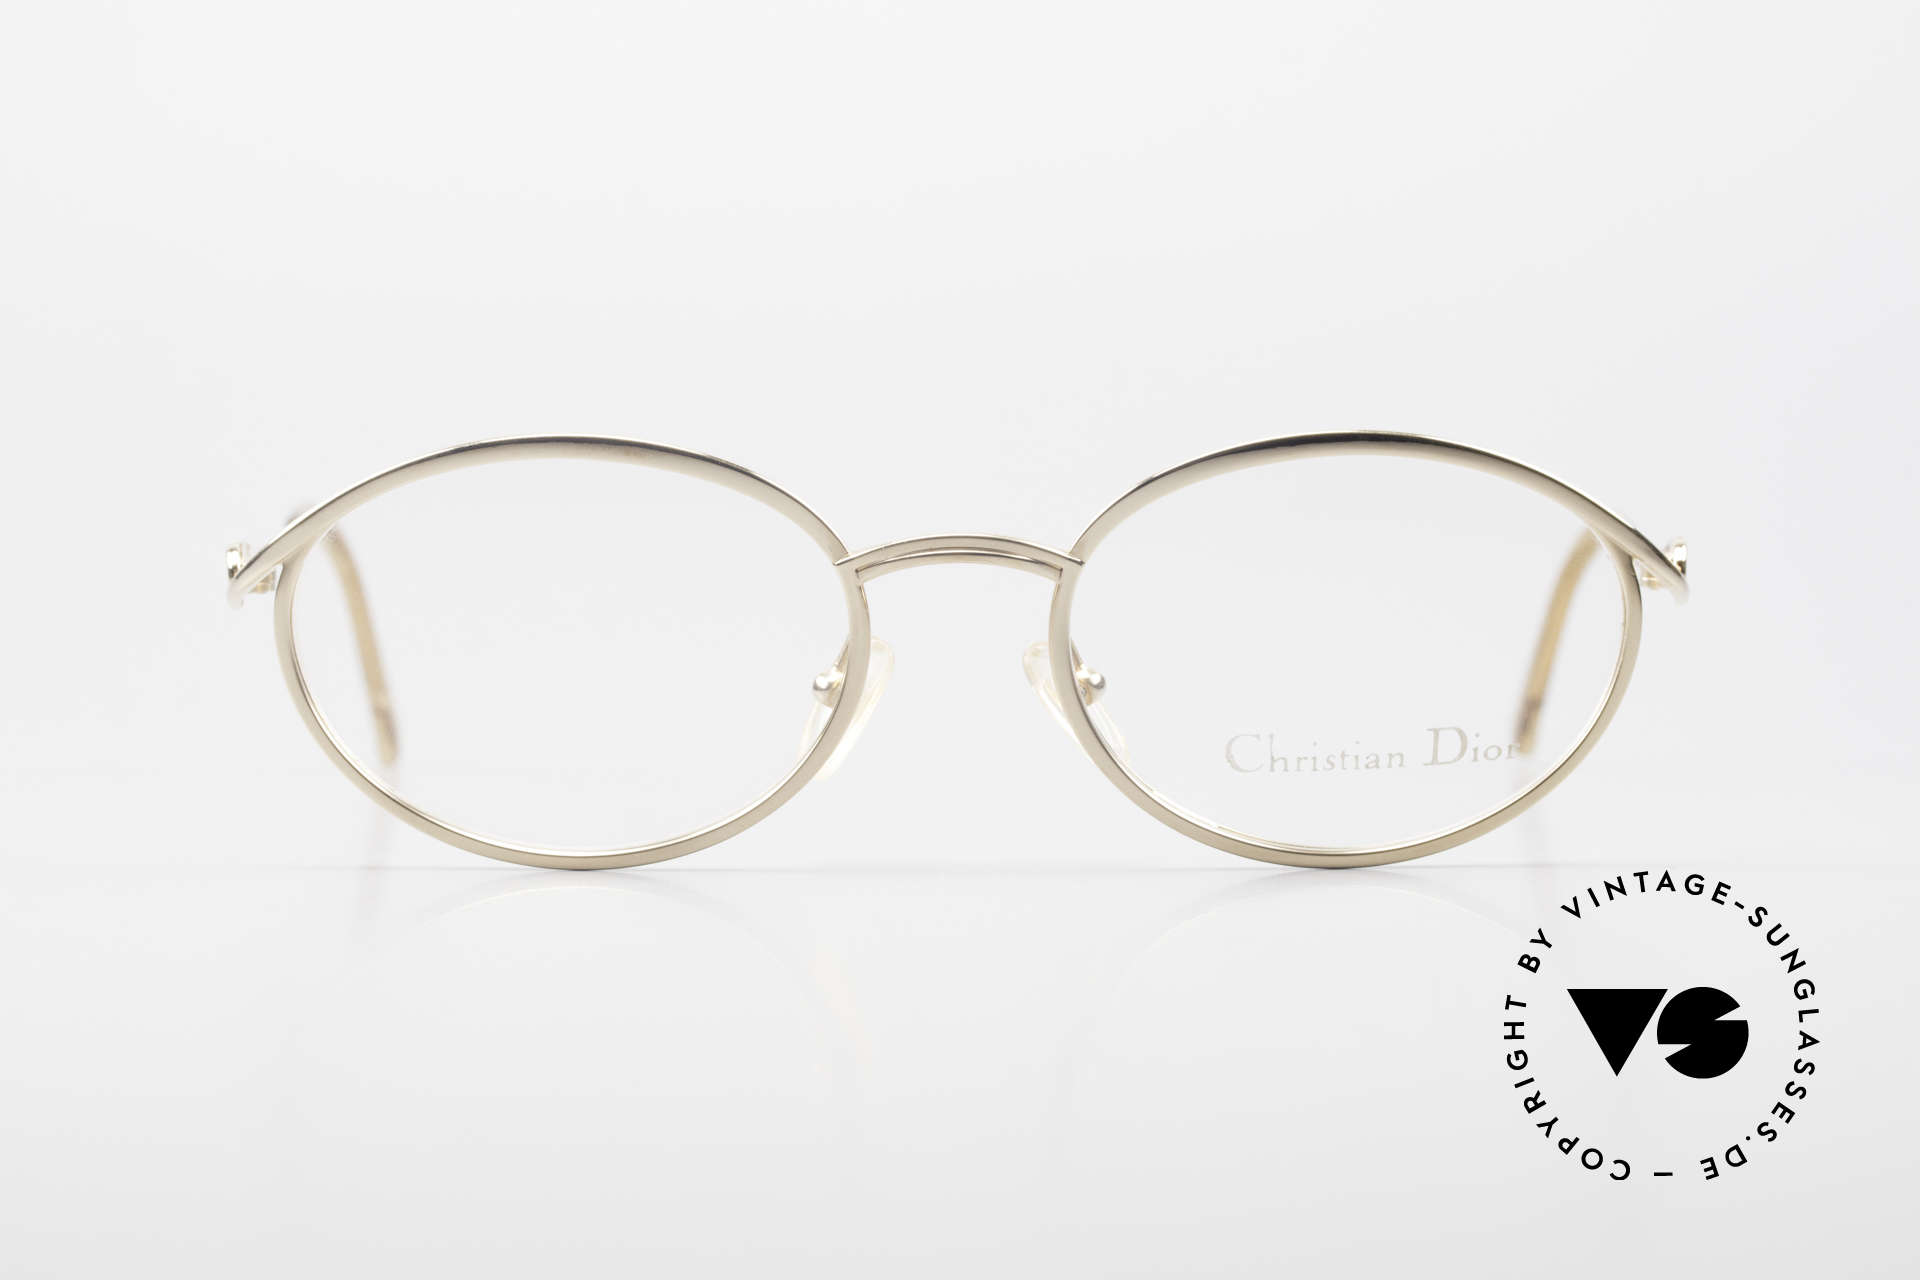 Christian Dior 2939 Ladies 90's Frame Gold Plated, feminine elegant design with orig. demo lenses, Made for Women